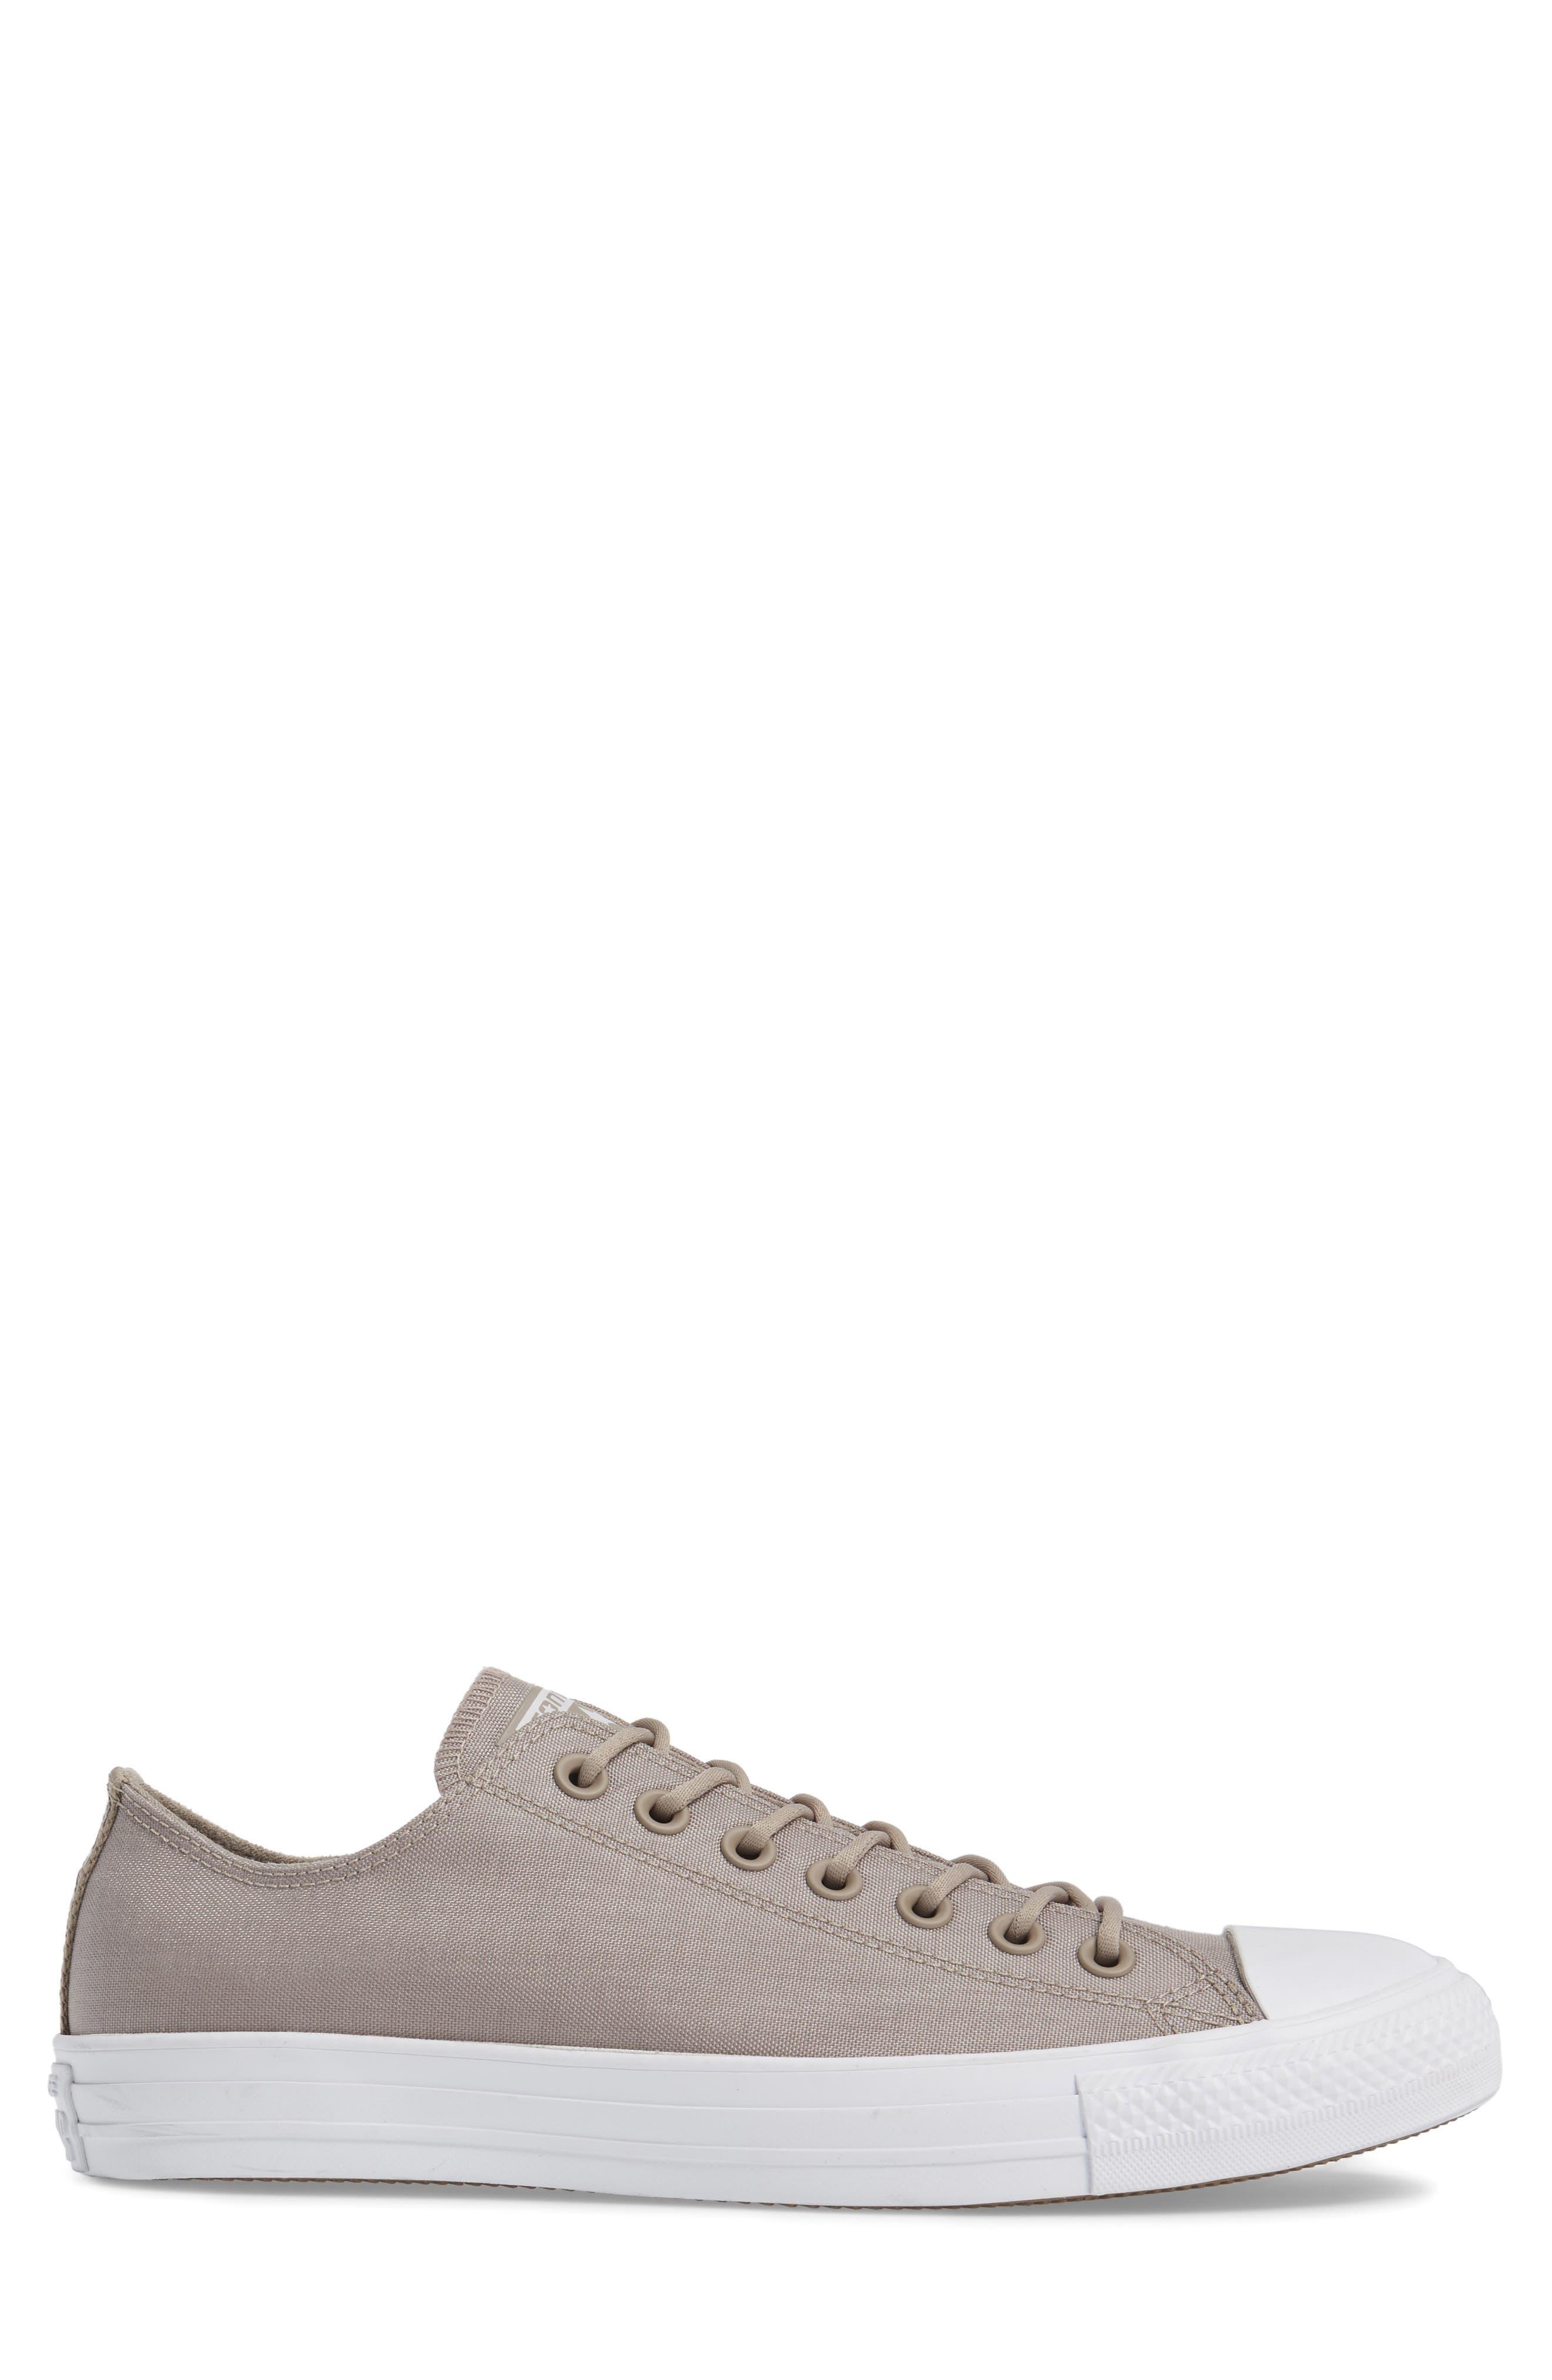 Alternate Image 3  - Converse Chuck Taylor® All Star® Ox Sneaker (Men)